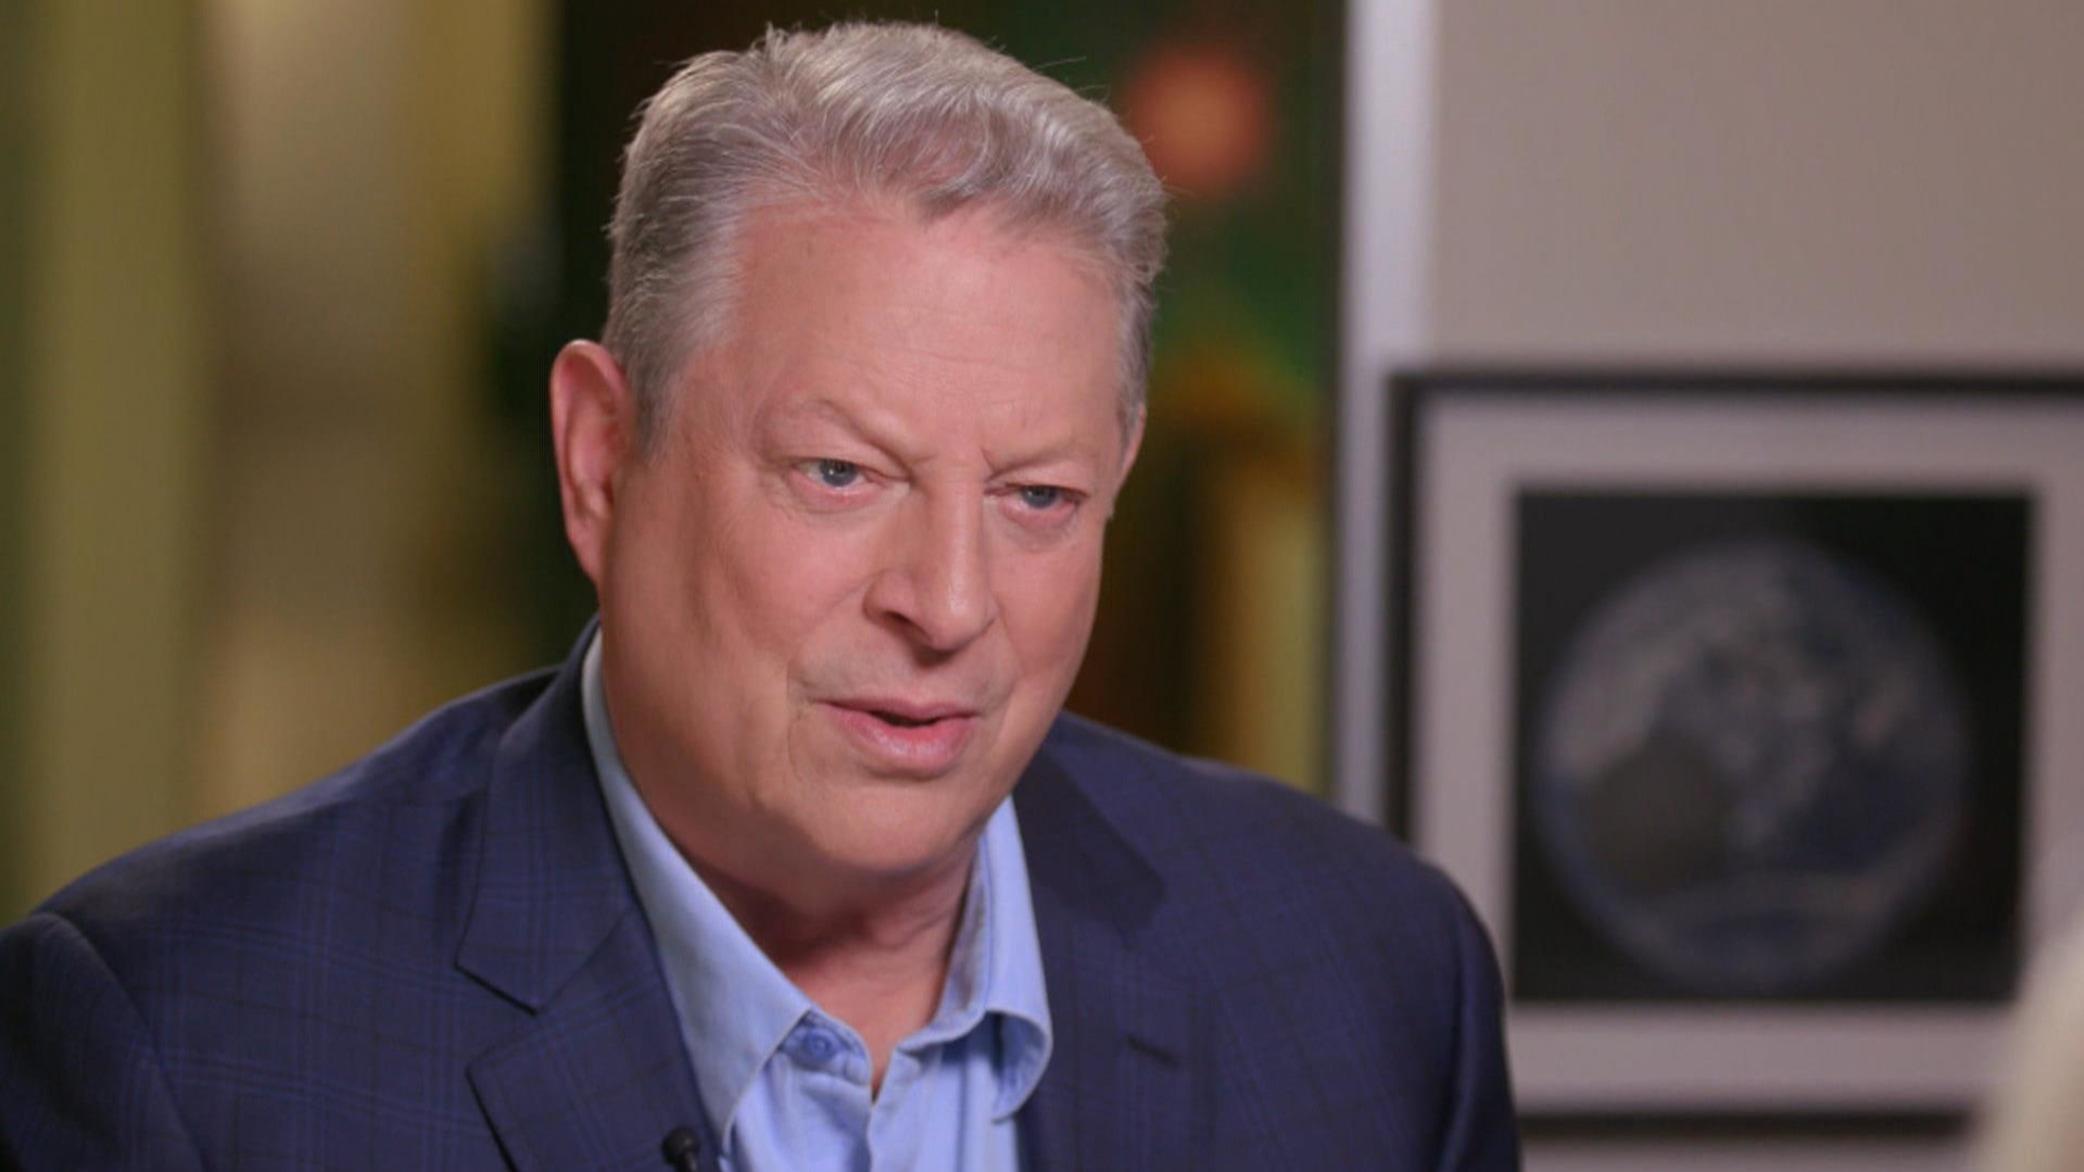 Al Gore on 2016 campaign: 'Sometimes I do a double take'